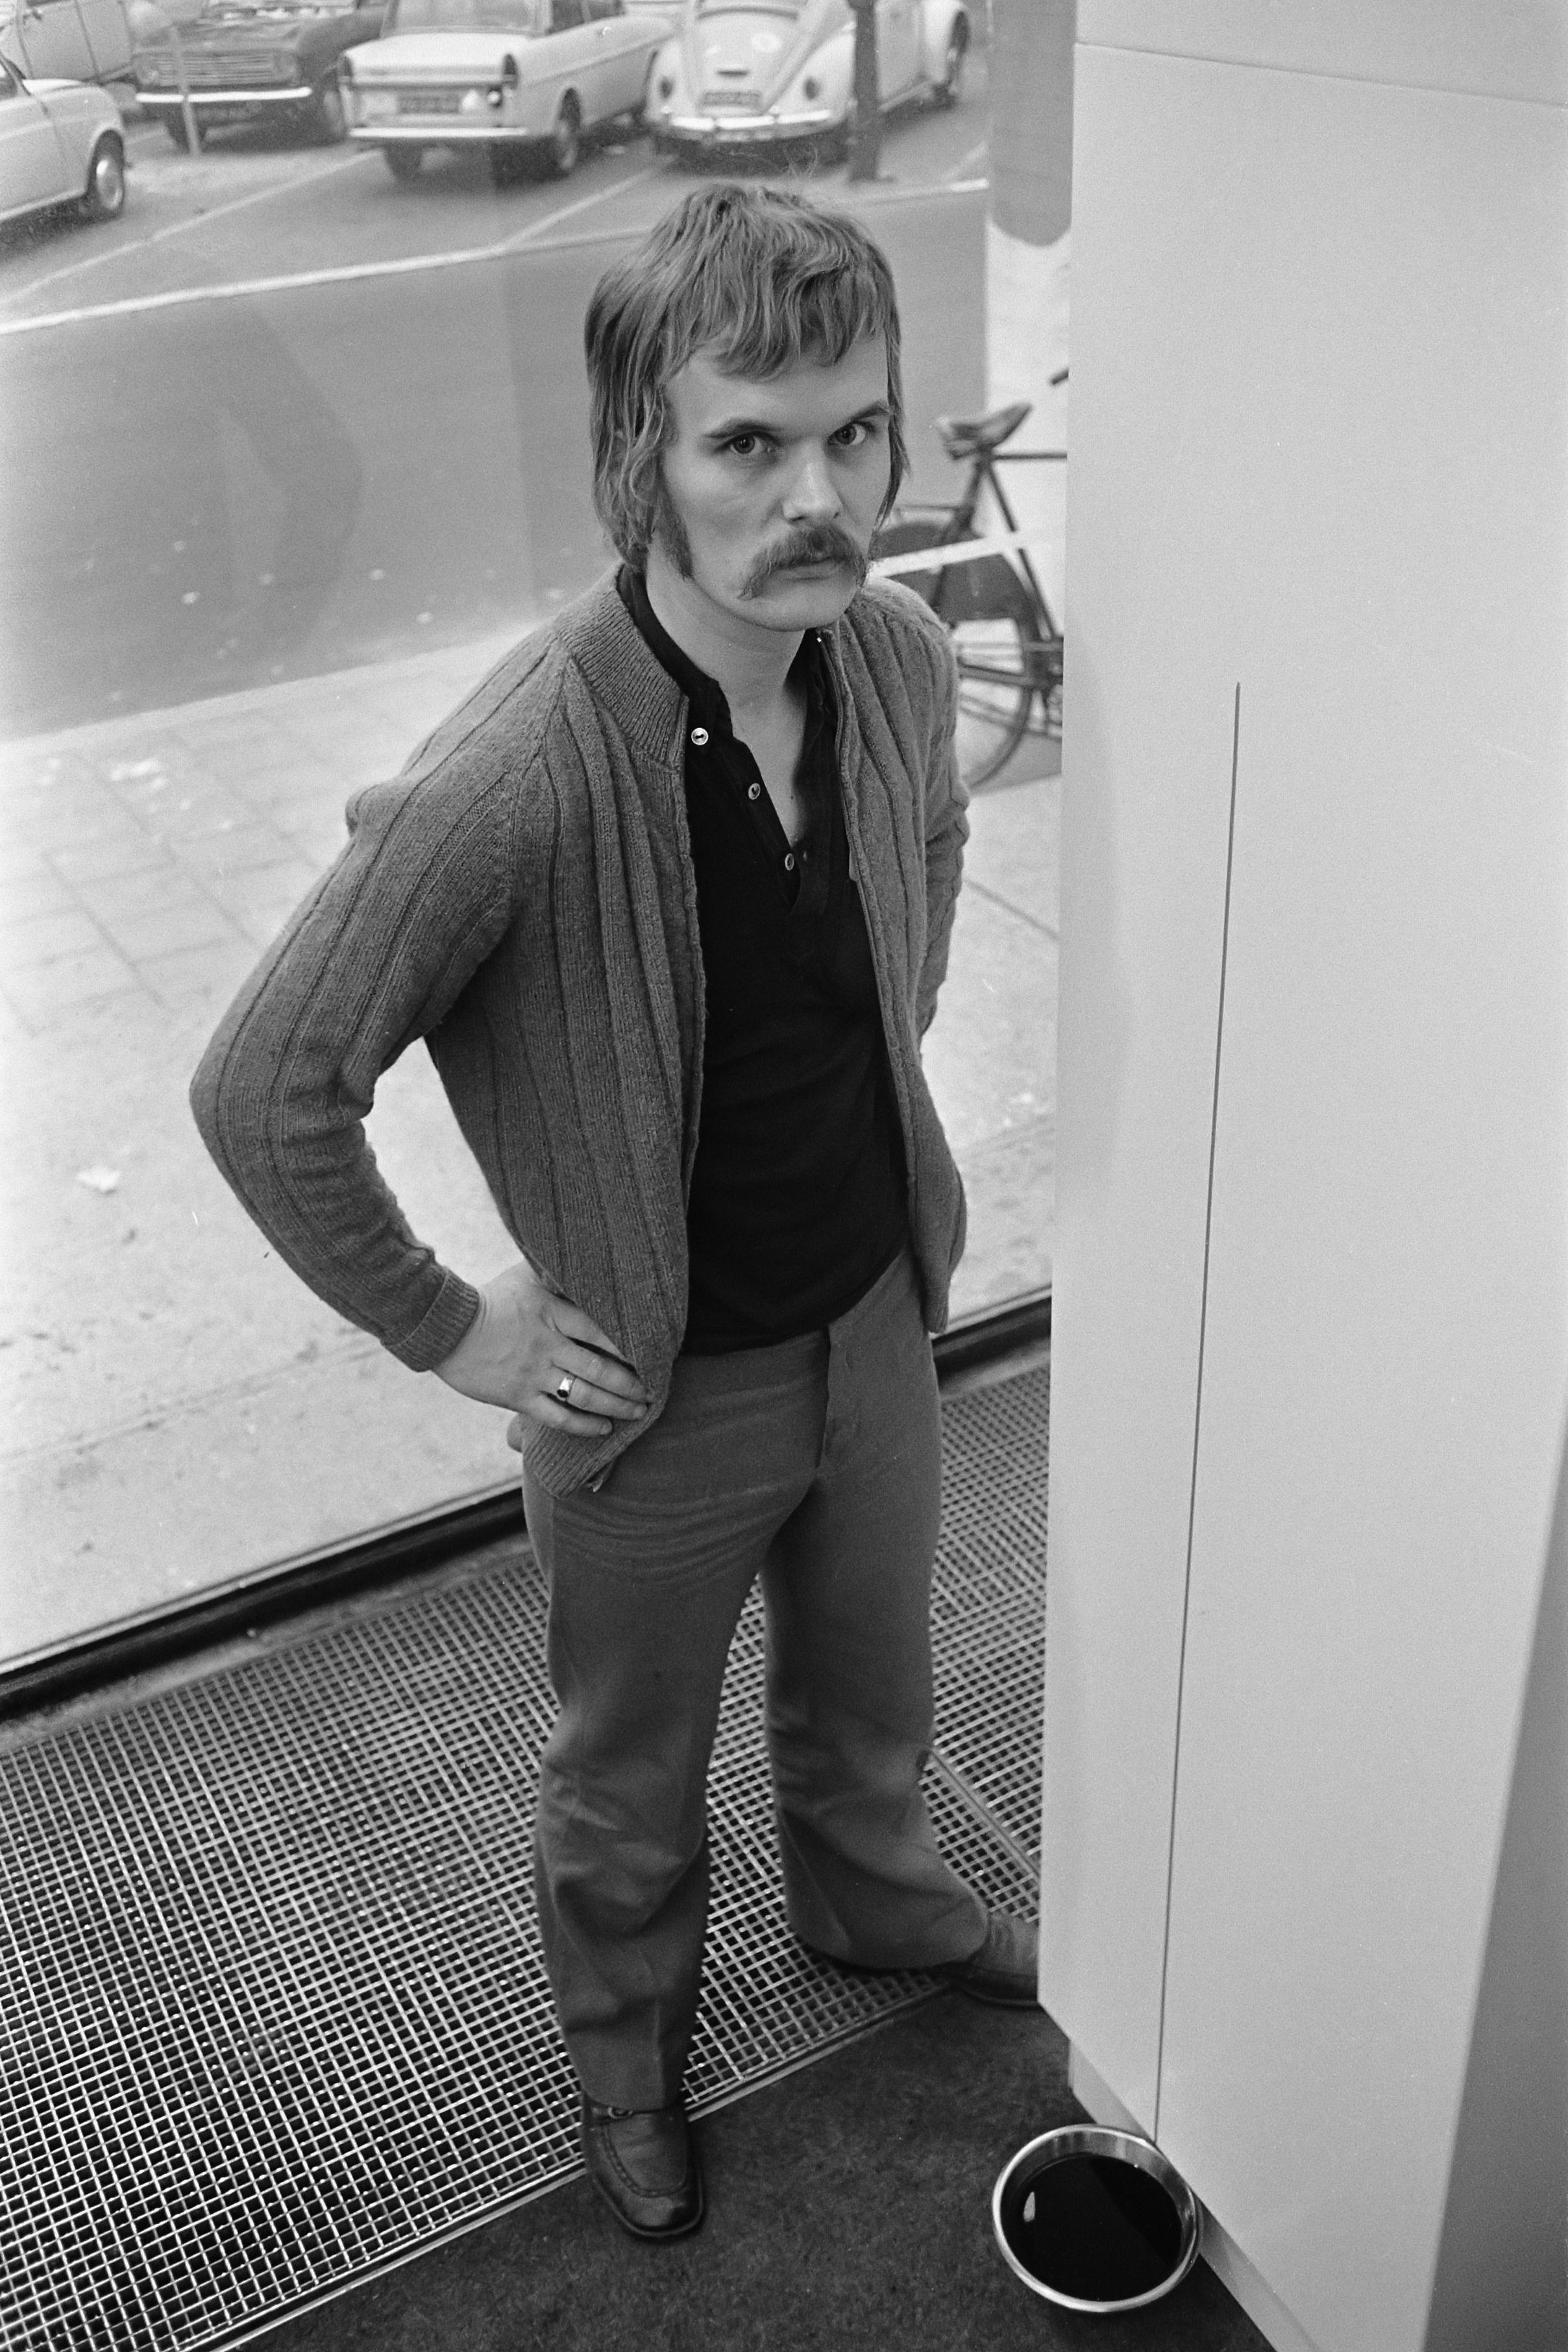 Image of Jan van Munster from Wikidata